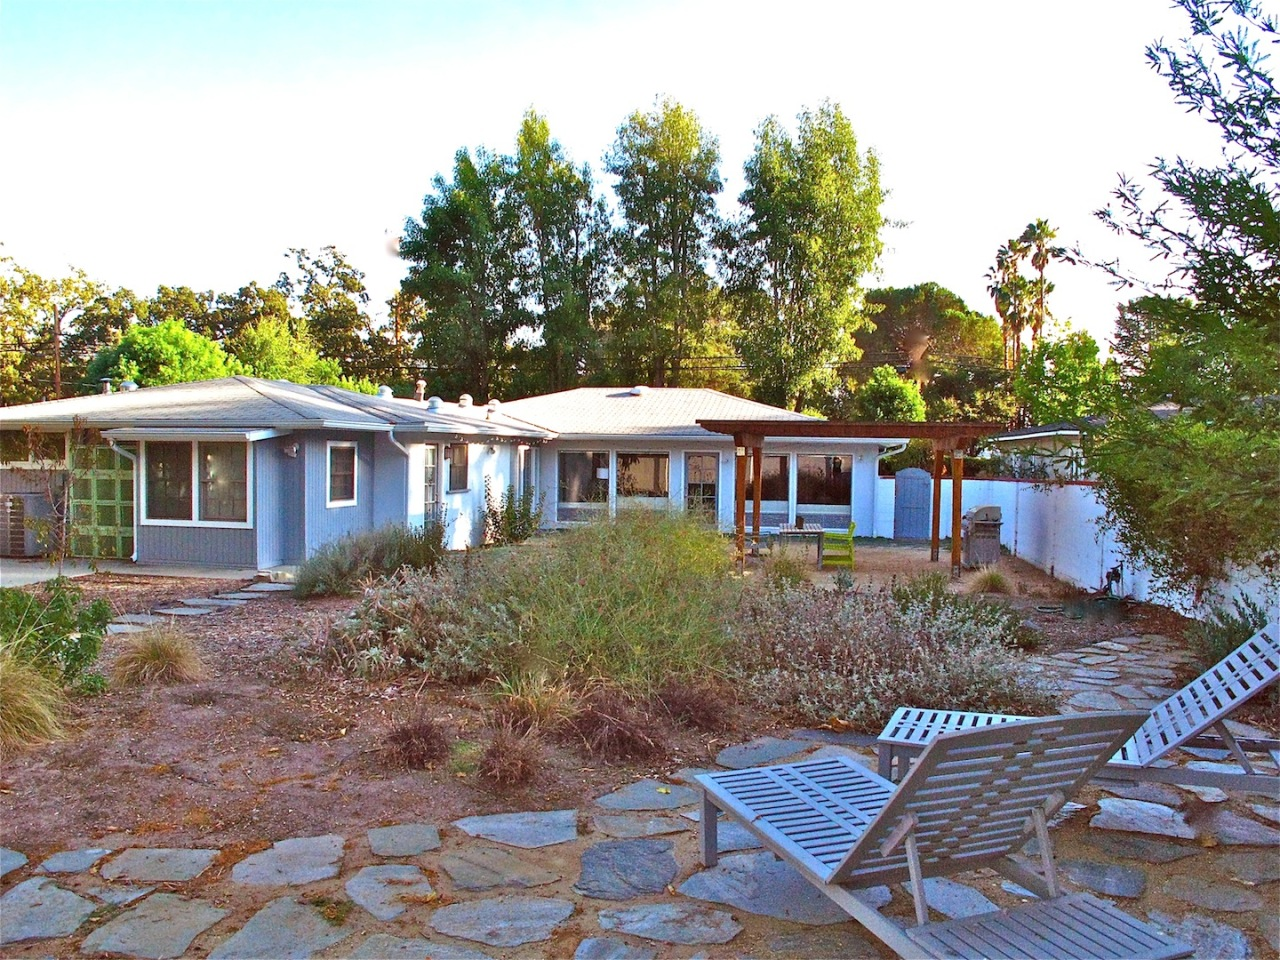 Property photo for 414 Grand Ojai, California 93023 - 12-3074